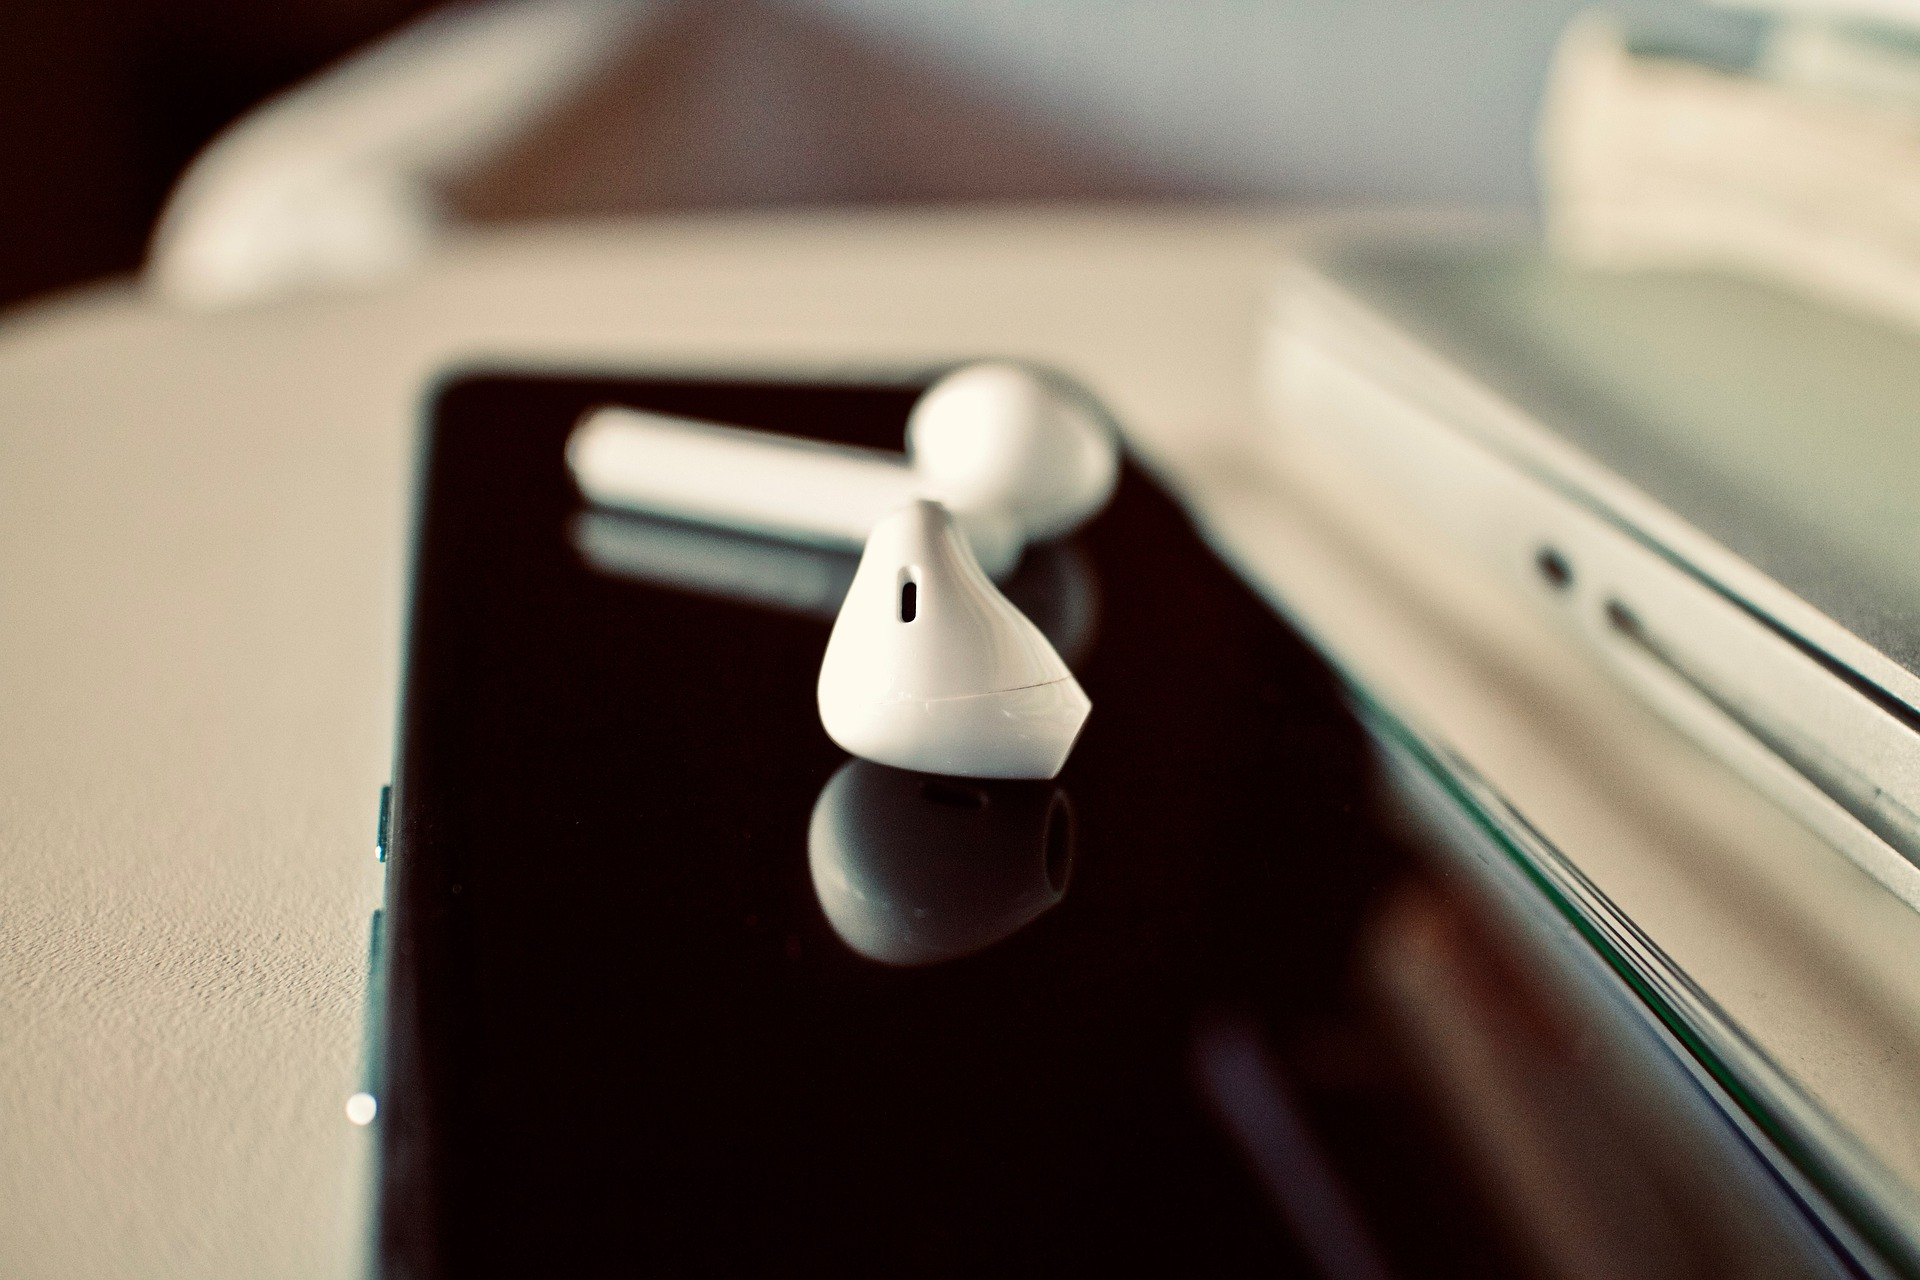 Airpod headphone on cell phone.